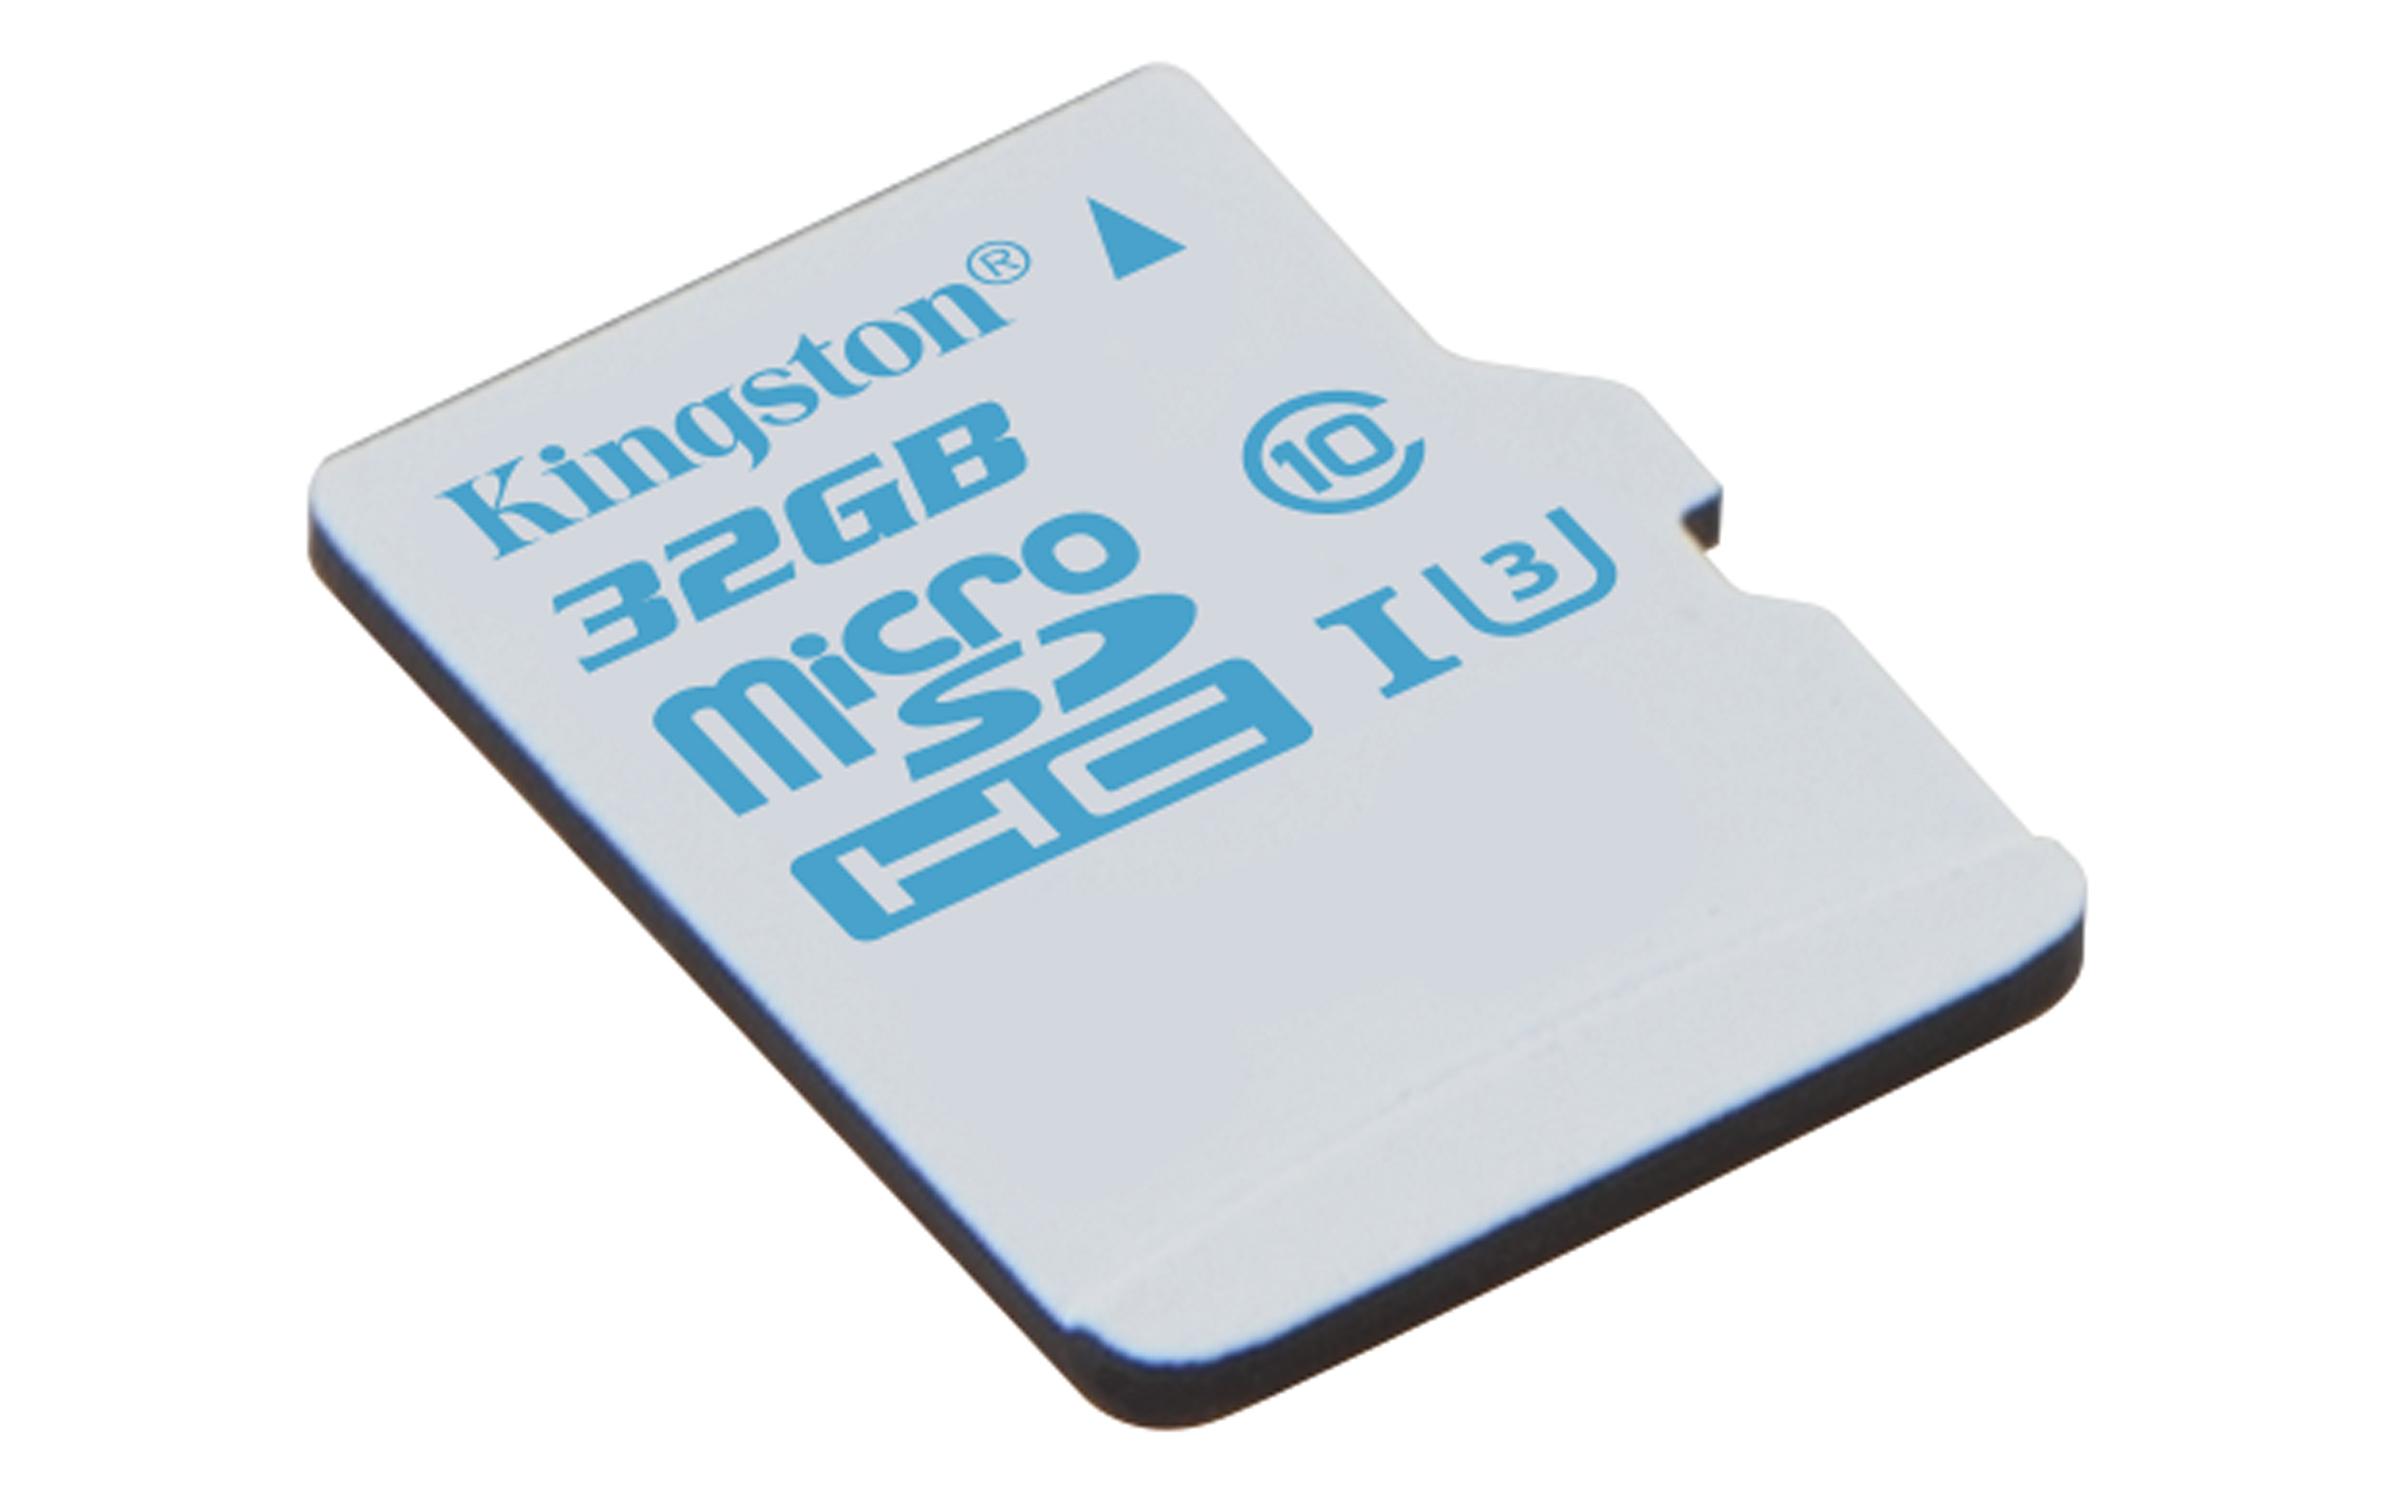 Kingston Technology microSD Action Camera UHS-I U3 32GB 32GB MicroSDHC UHS-I Class 3 memory card